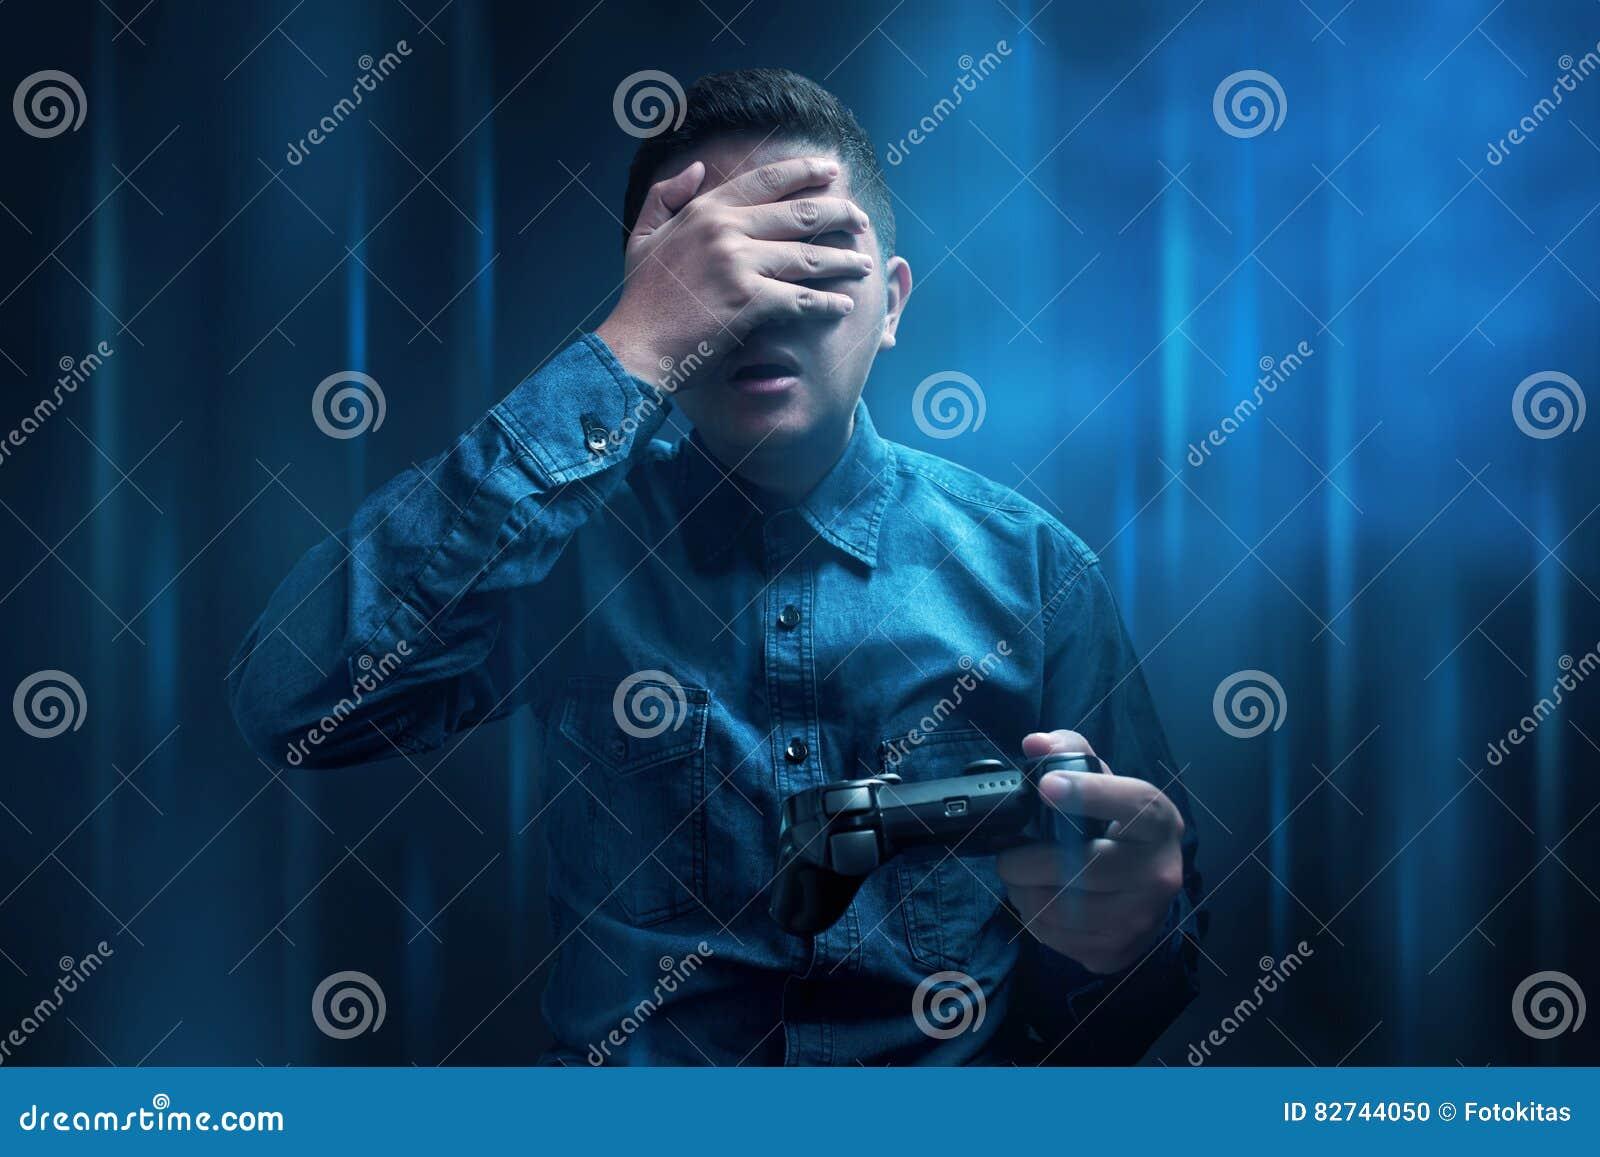 Young man lose playing game